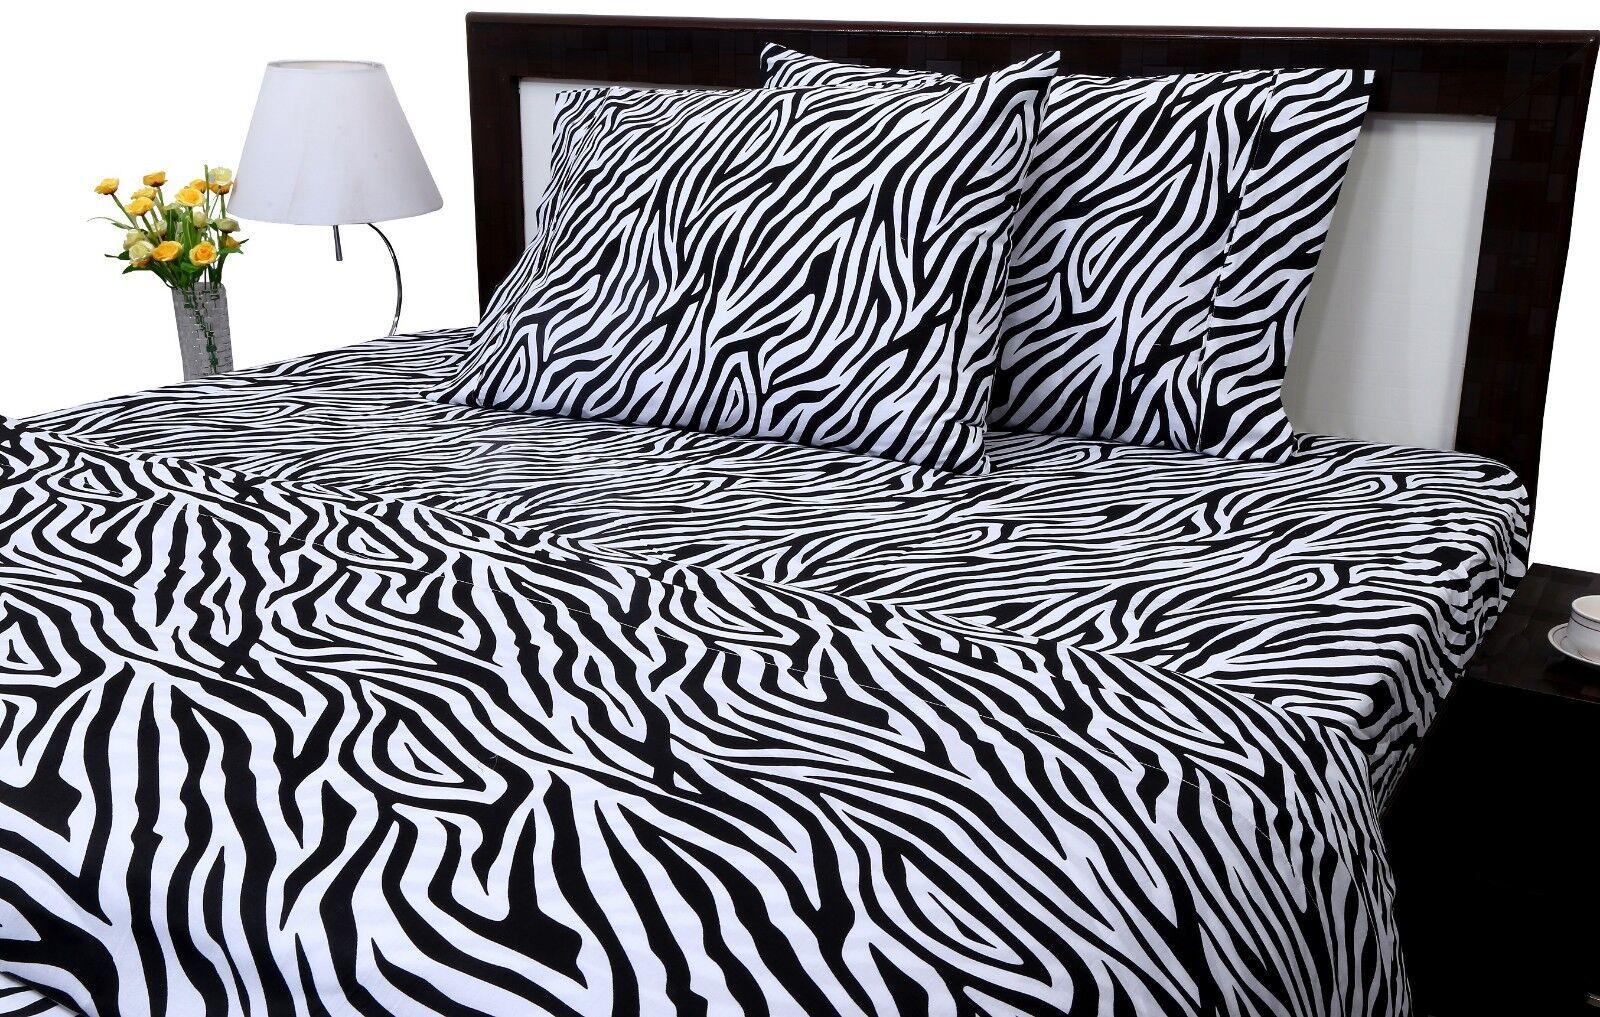 Luxury Bedding Set All Size And Zebra Print 600 TC Pure Cotton 15  Deep